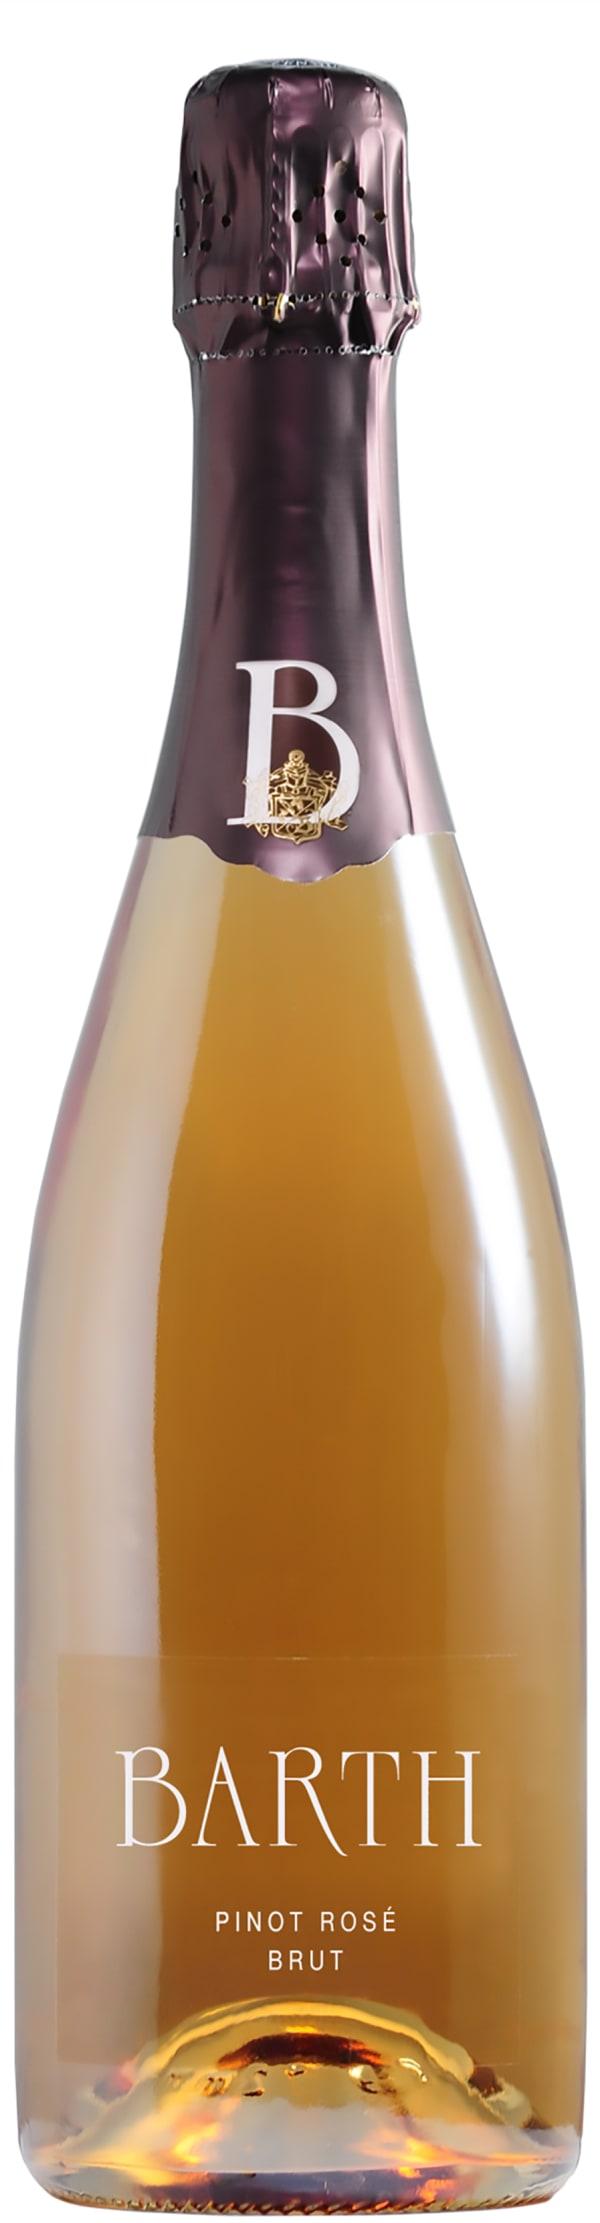 Barth Pinot Rosé Brut